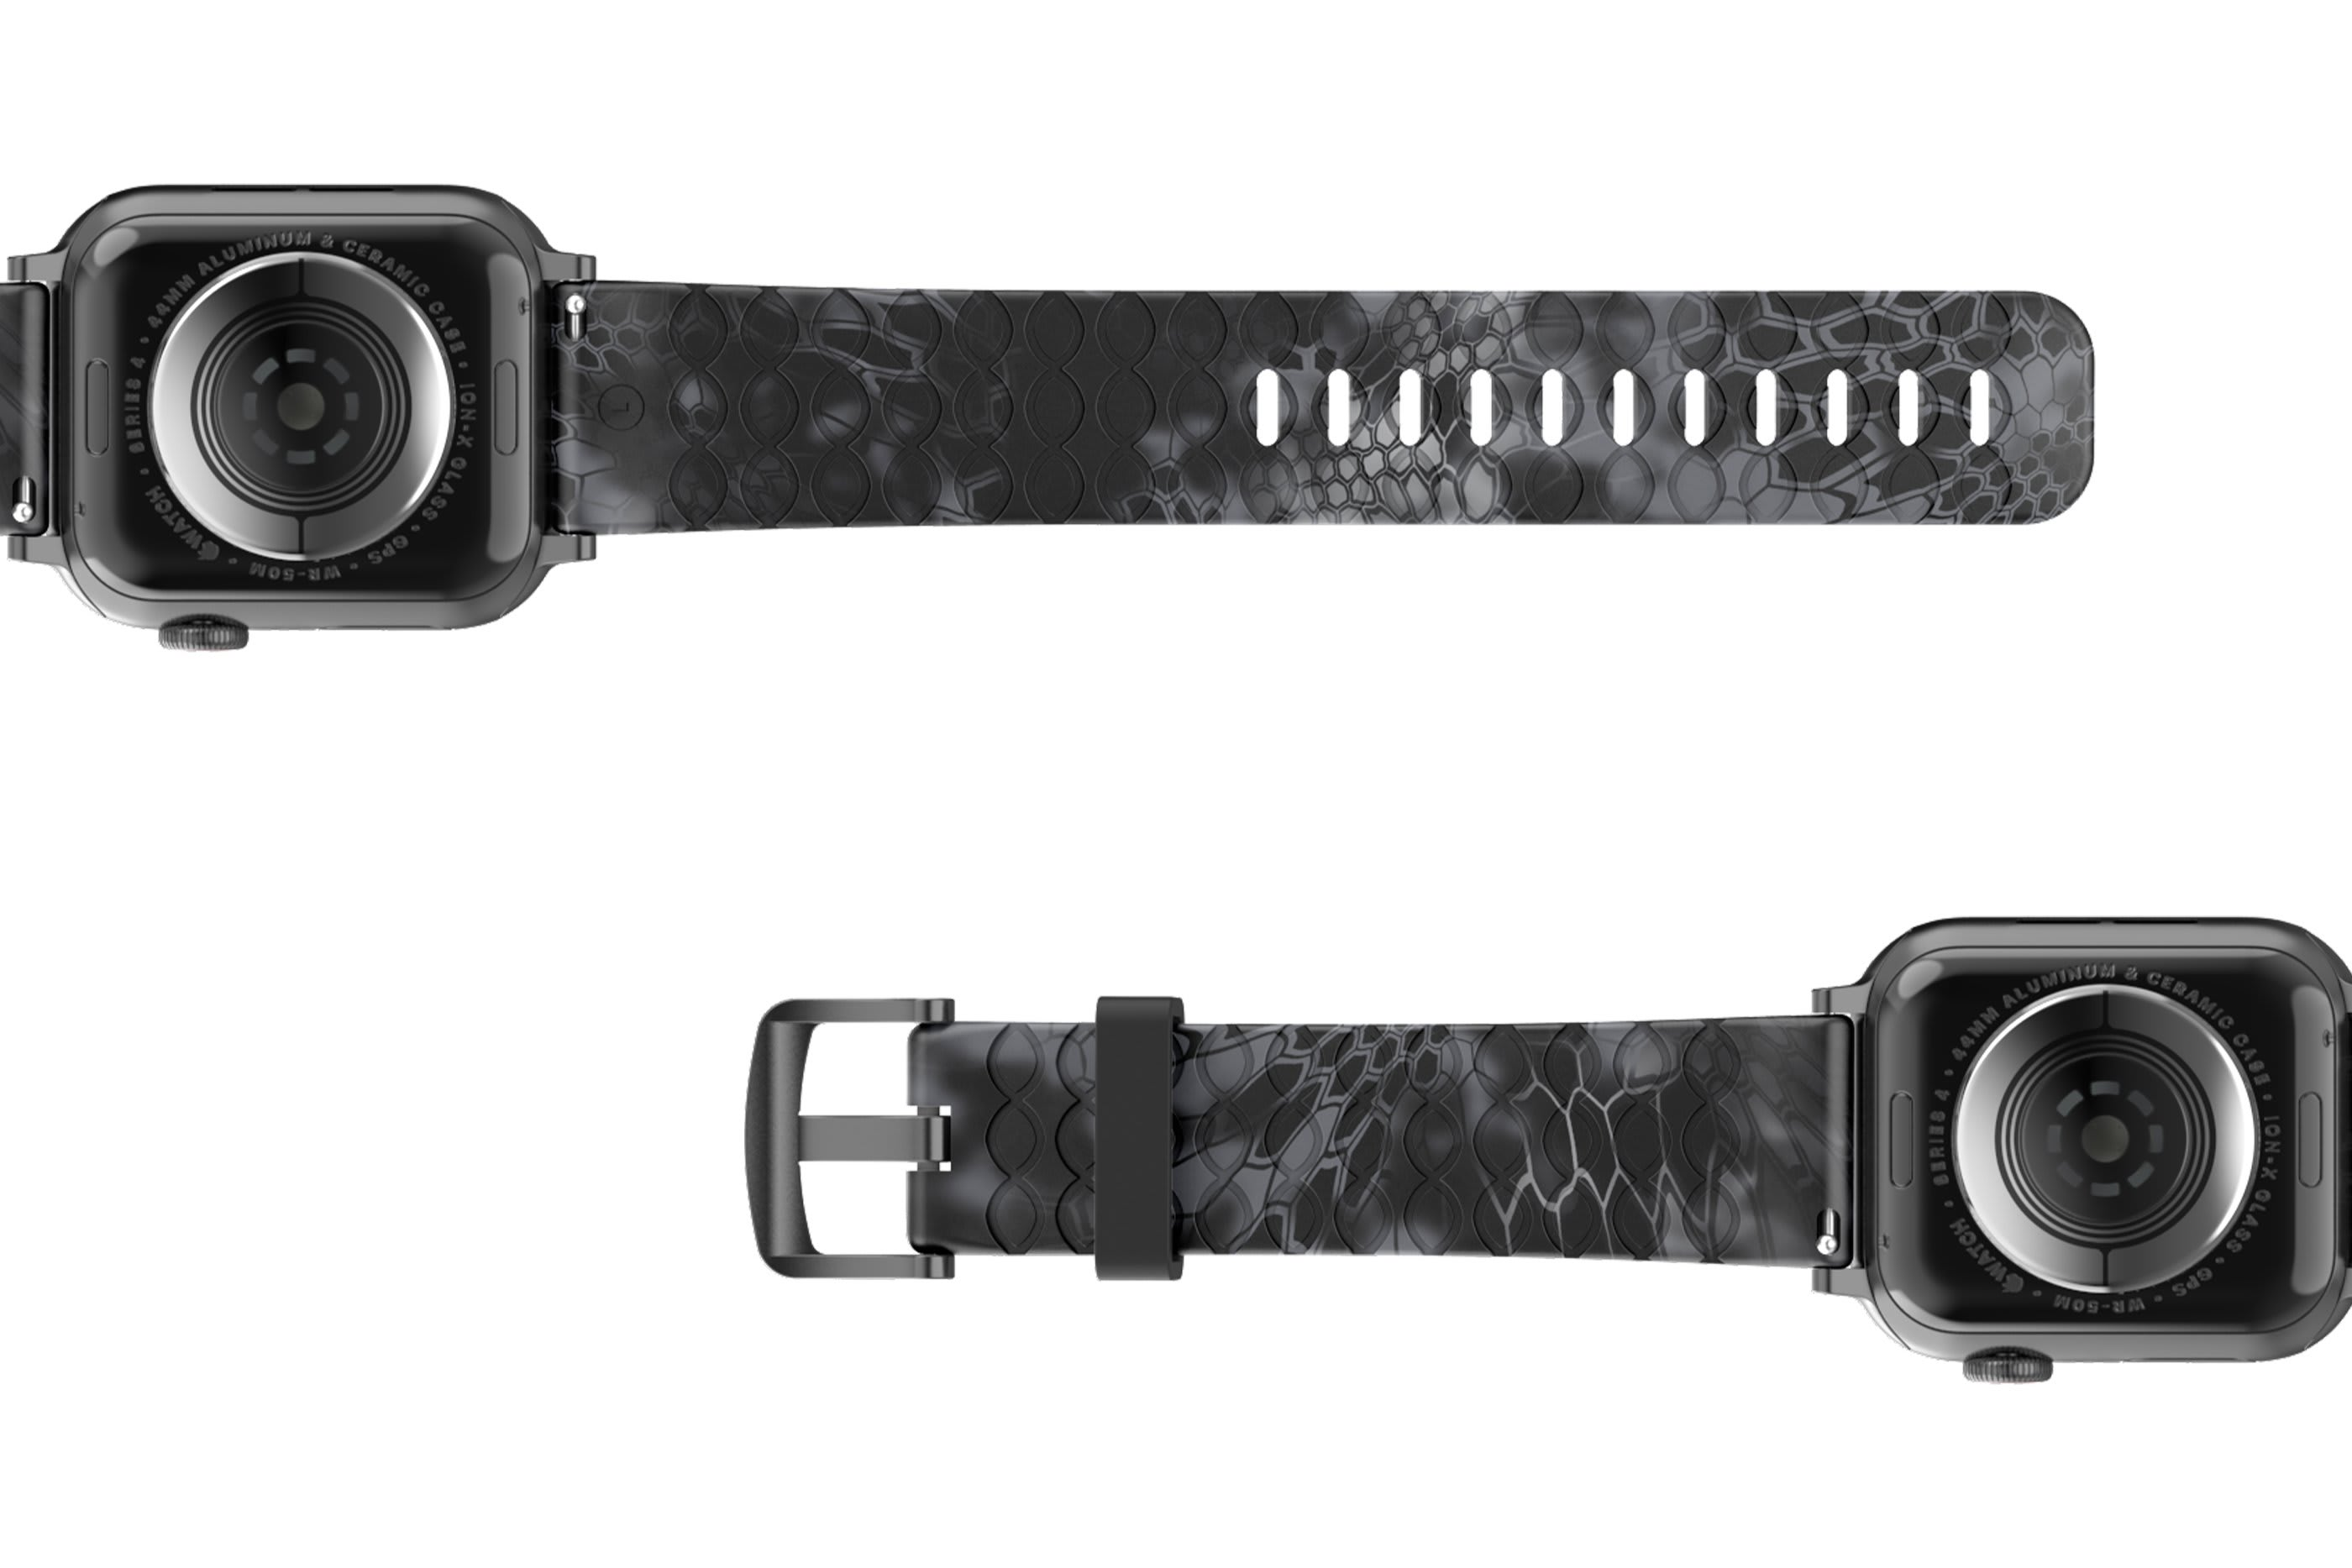 Kryptek Typhon Apple Watch Band with gray hardware viewed bottom up